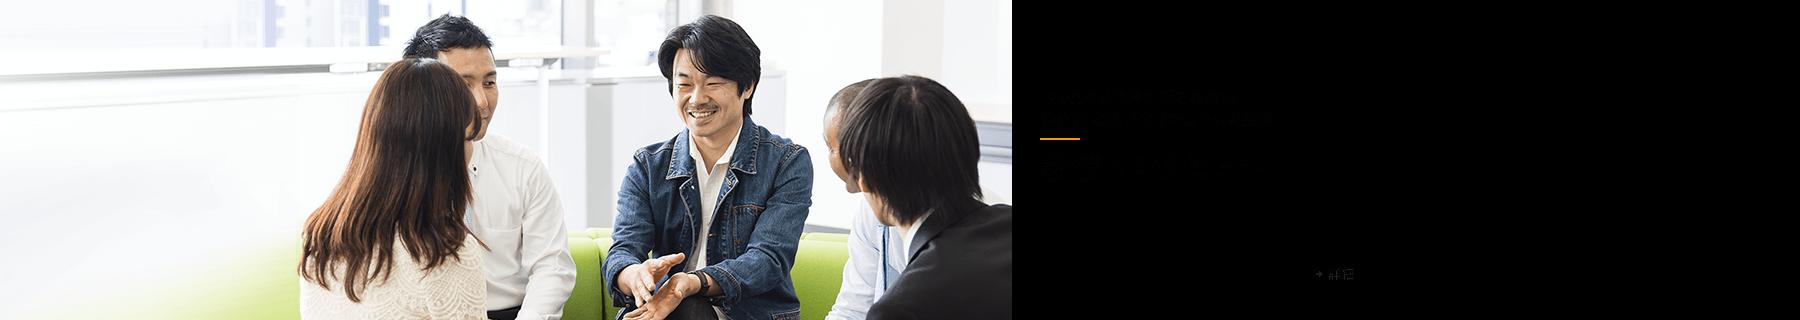 MBAという枠に縛られない自由度の高いカリキュラムを実現 教授インタビュー